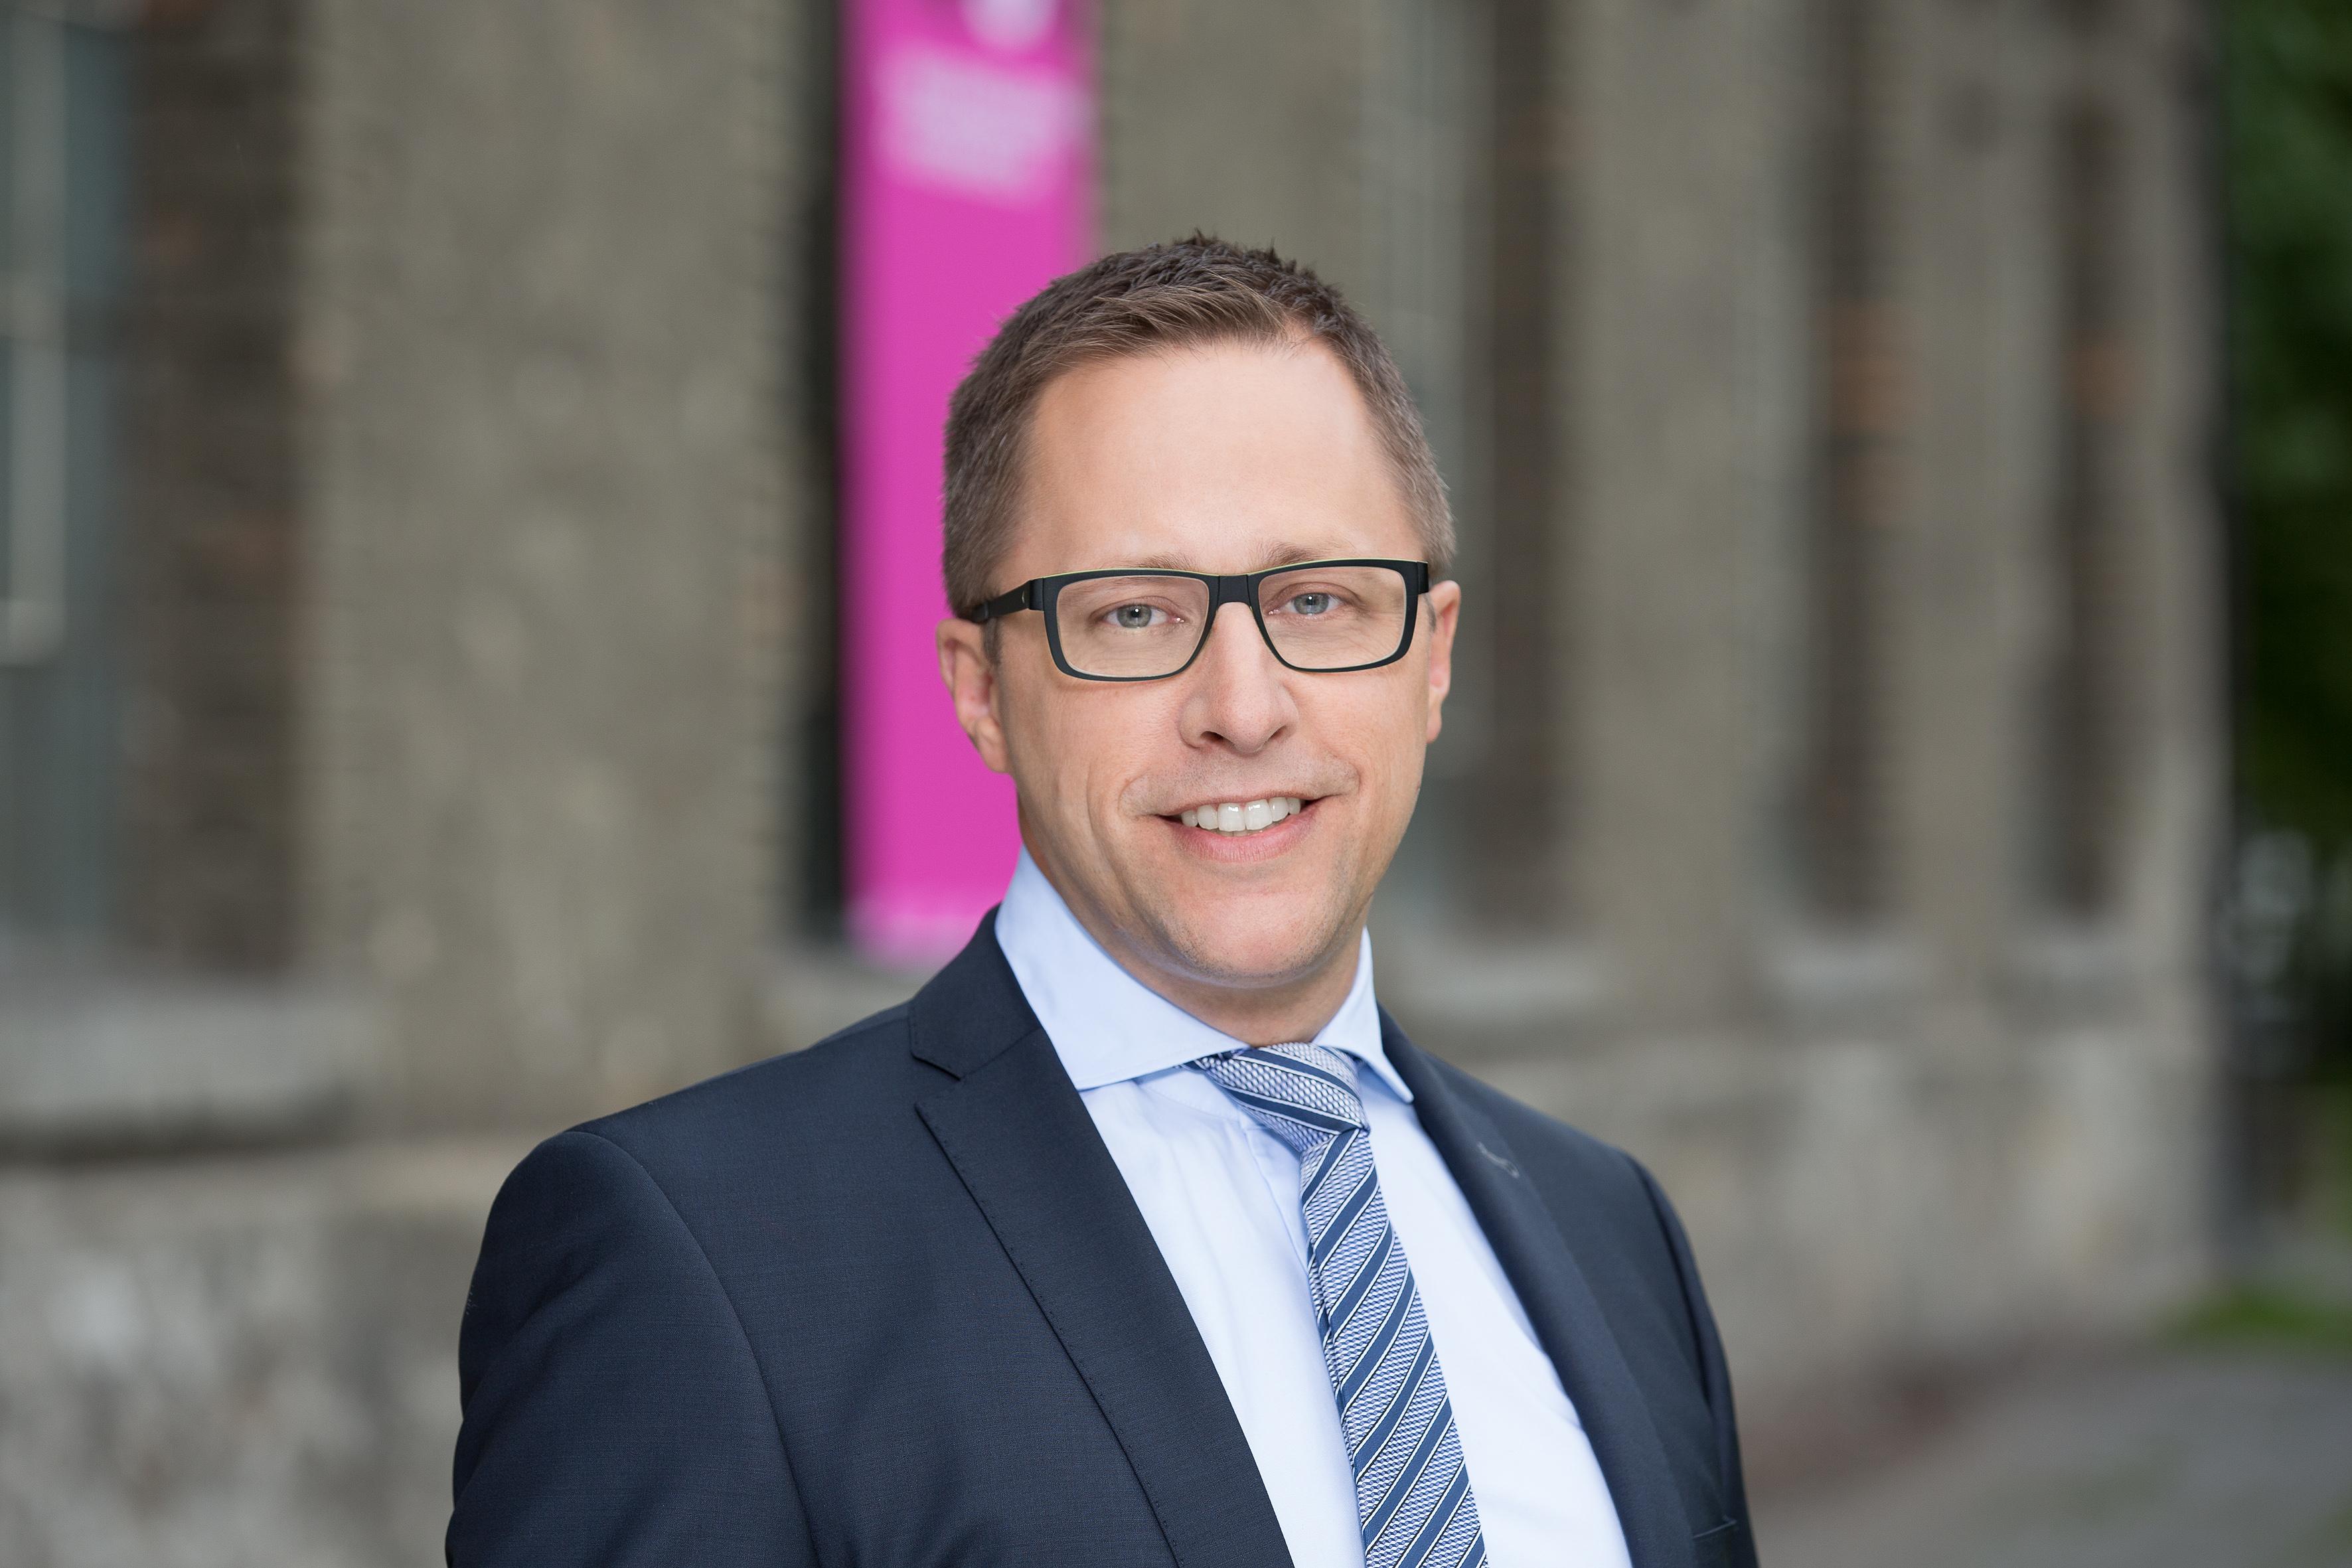 NEOS-Landtagsabgeordneter Daniel Matt